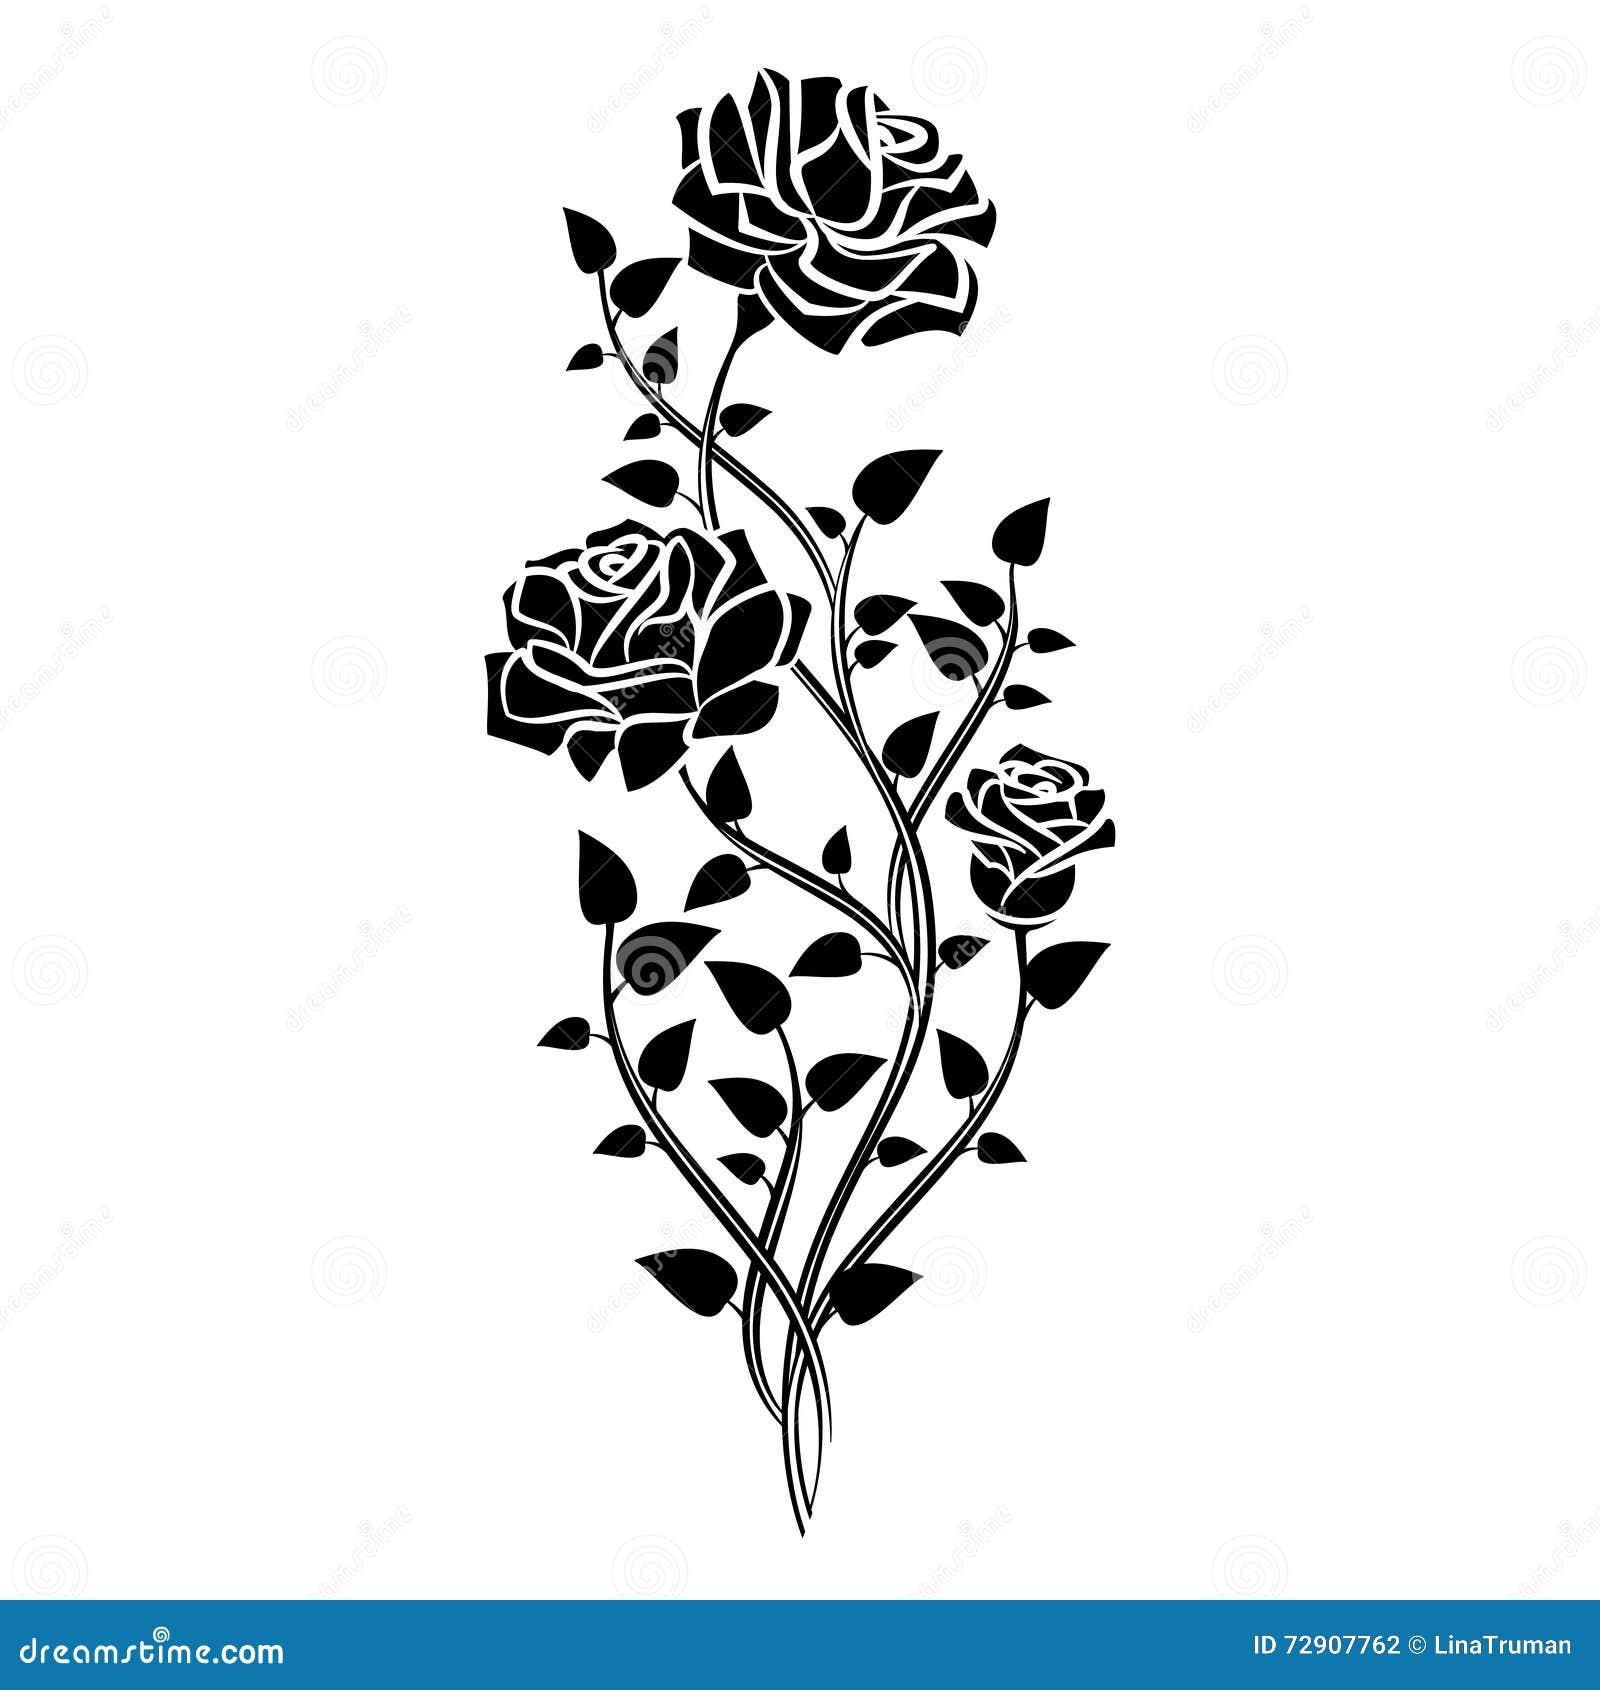 Ornament Of Roses Decorative Floral Design Elements Vector Stock